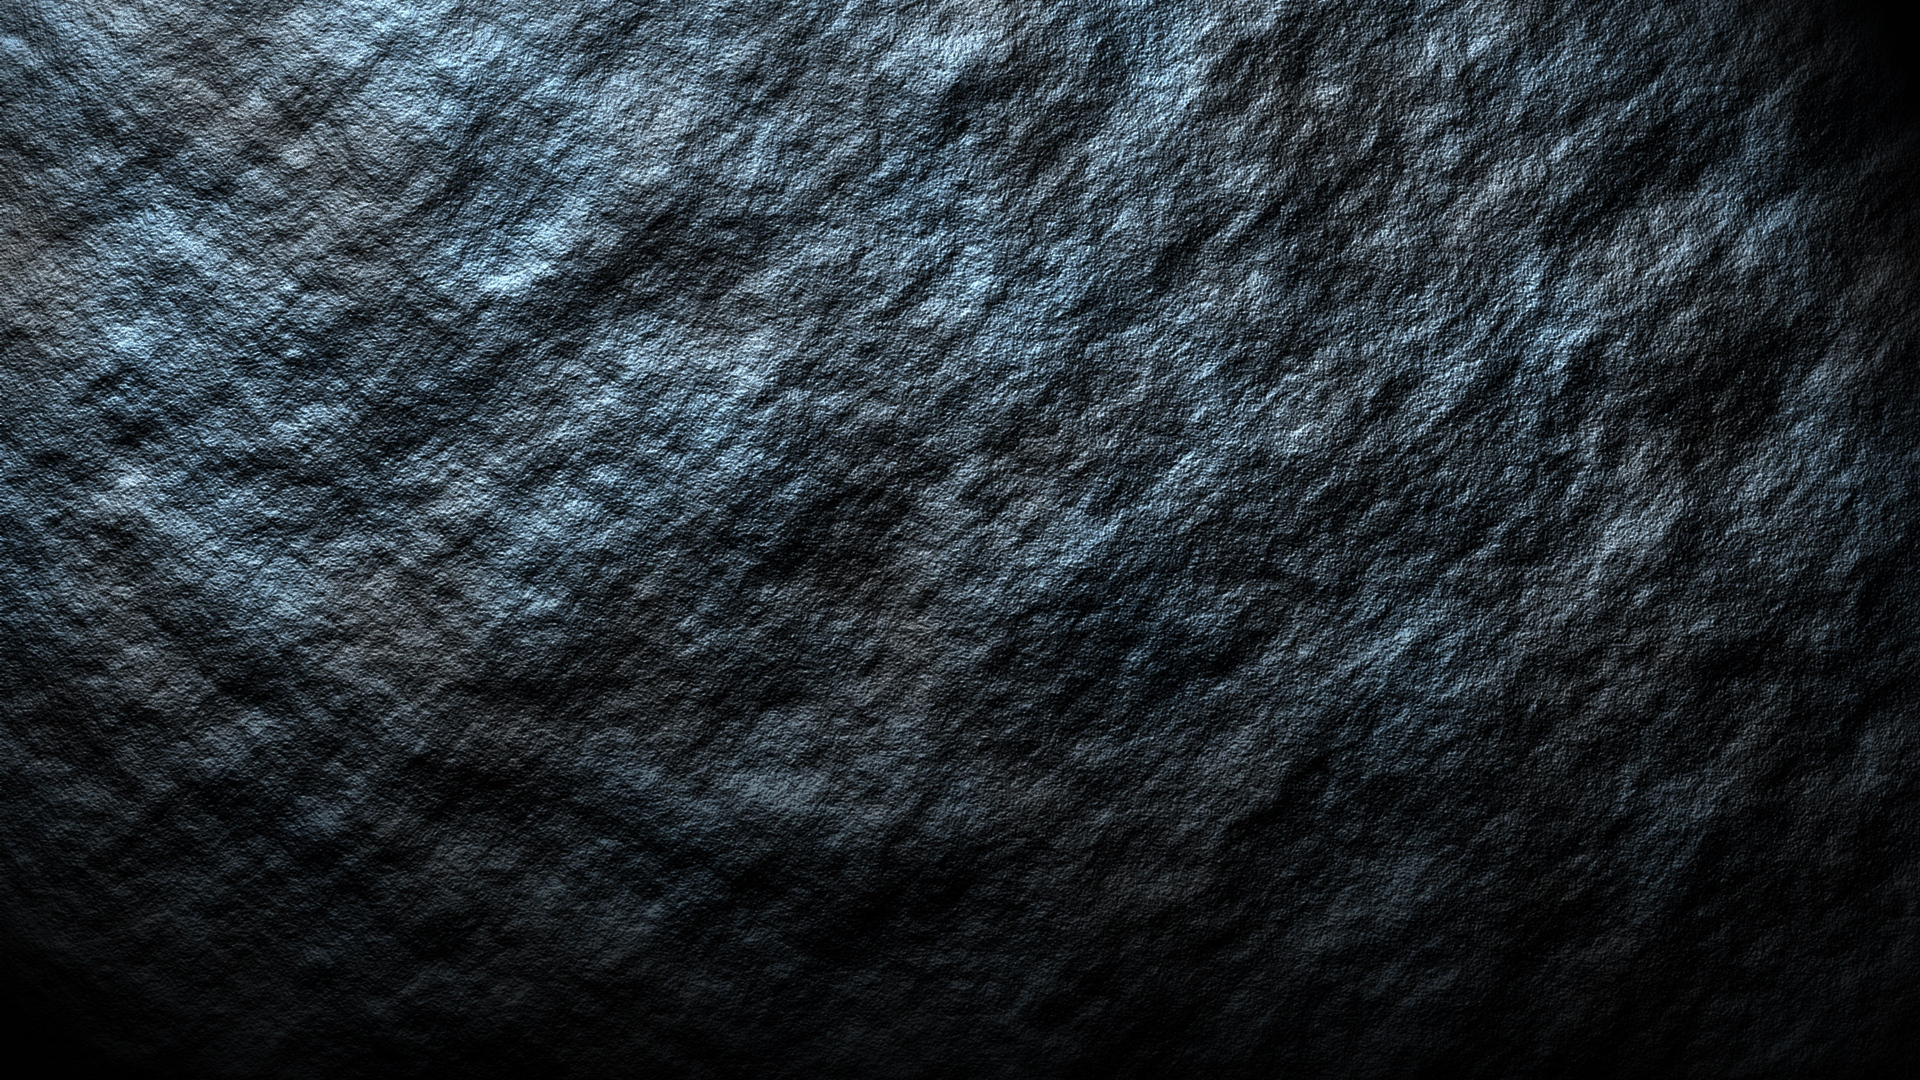 Dark rock surface photo